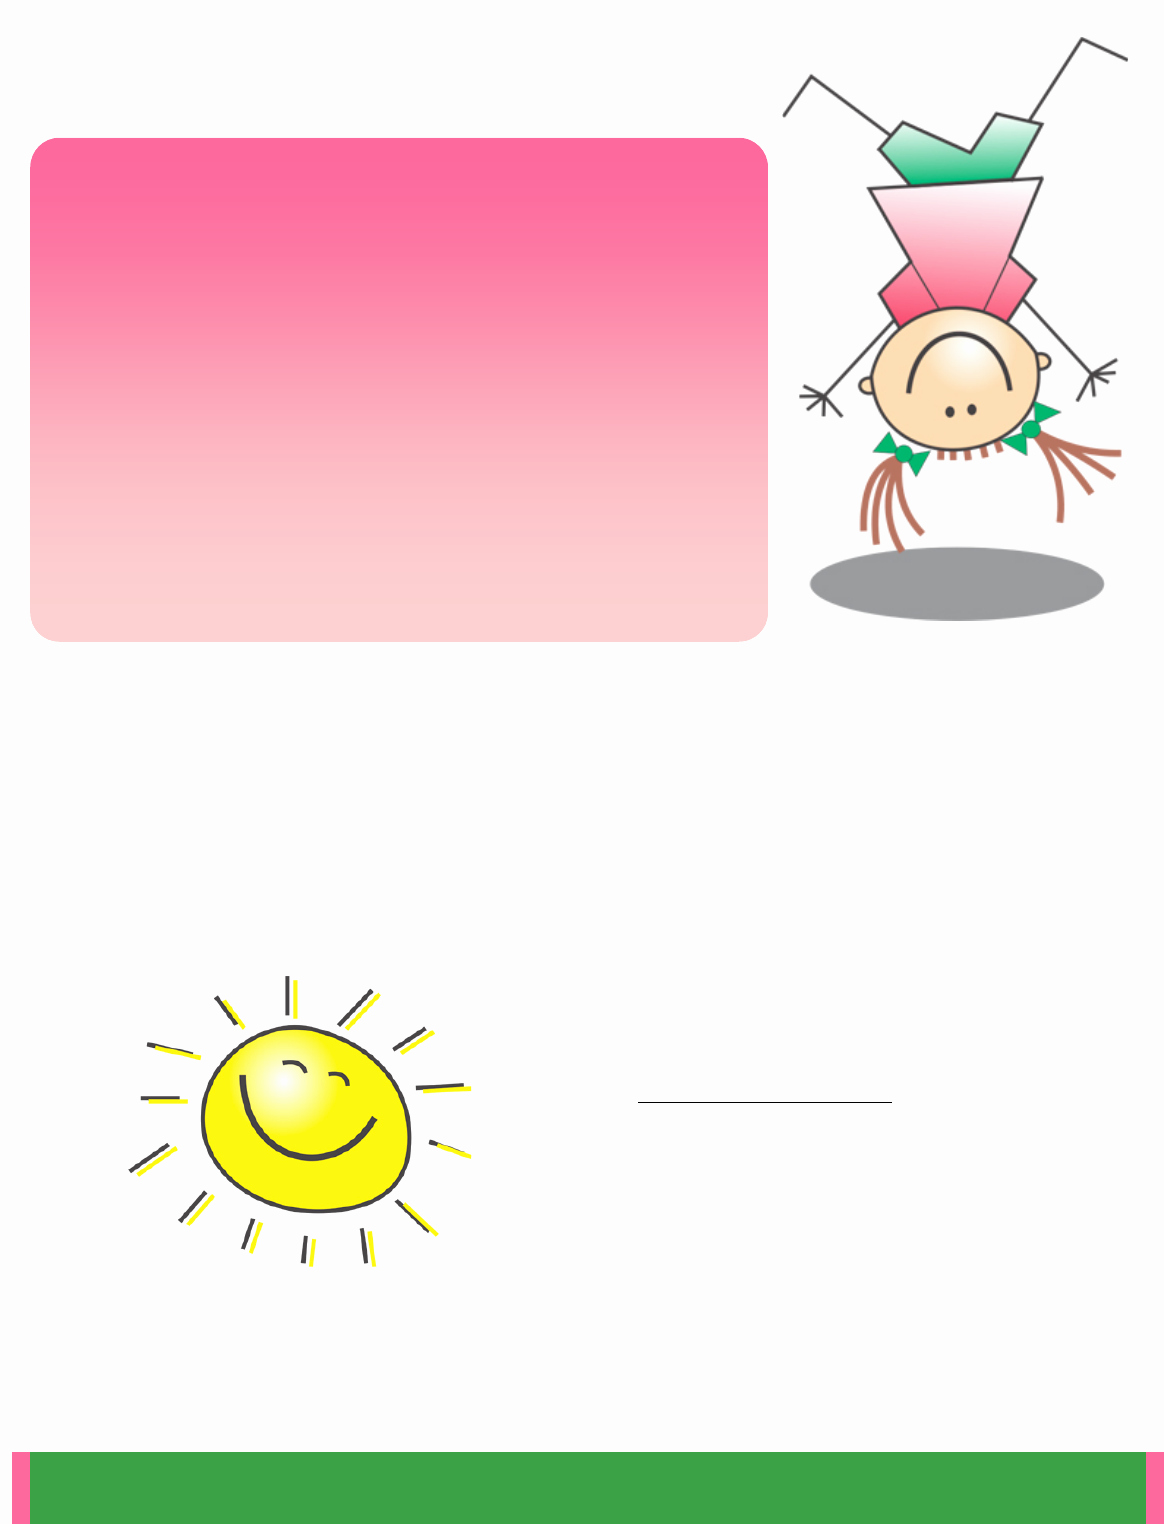 Preschool Newsletter Template Word Fresh Download Kids Preschool Newsletter Template Word format